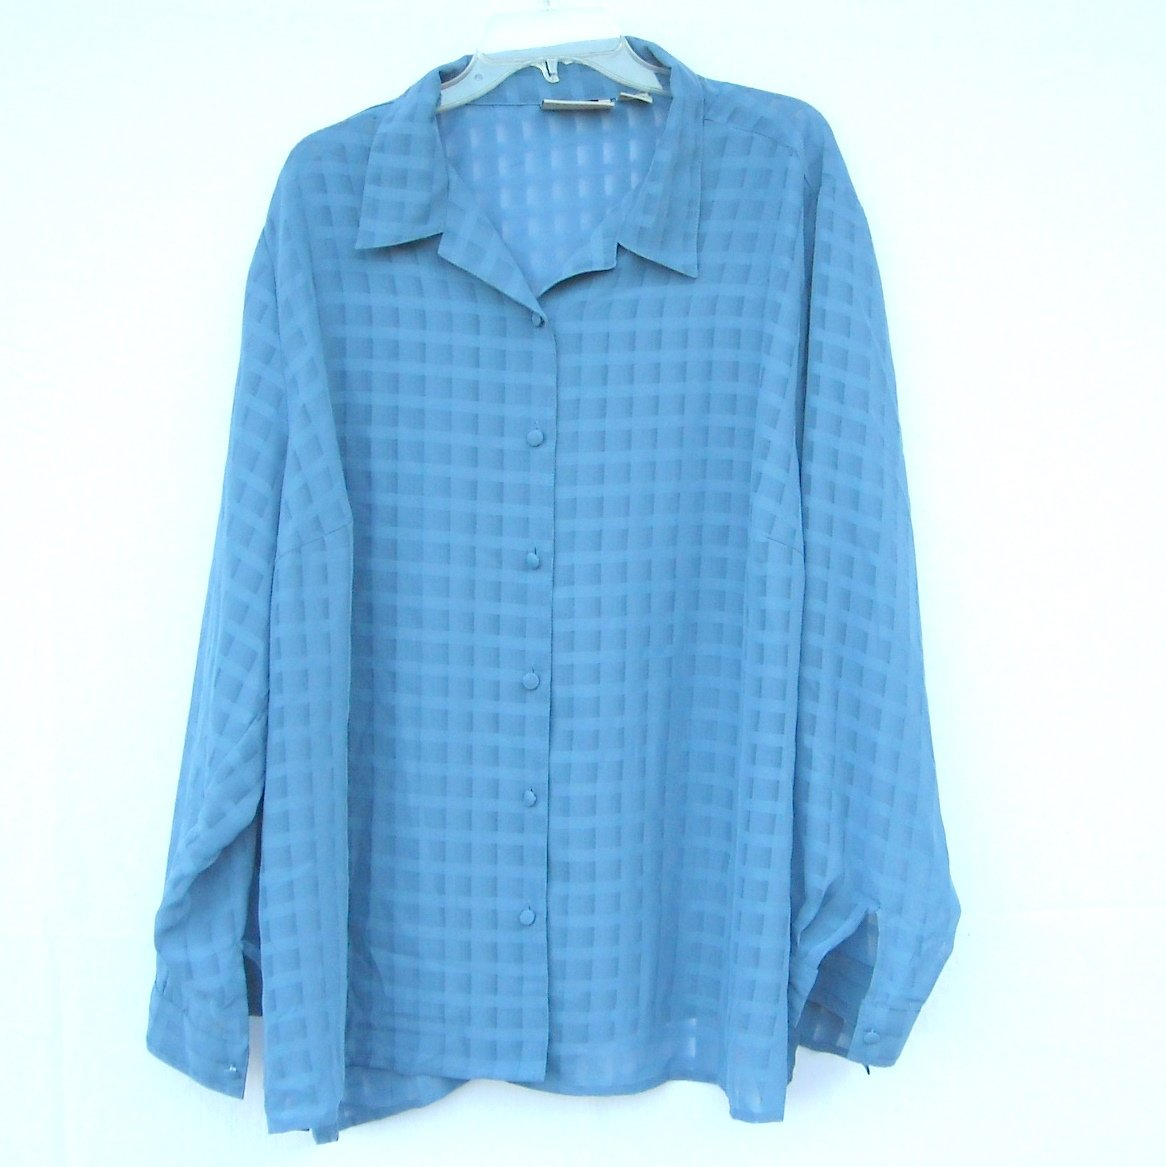 Maggie Barnes Womens Shirt Blouse Top Size 28 W